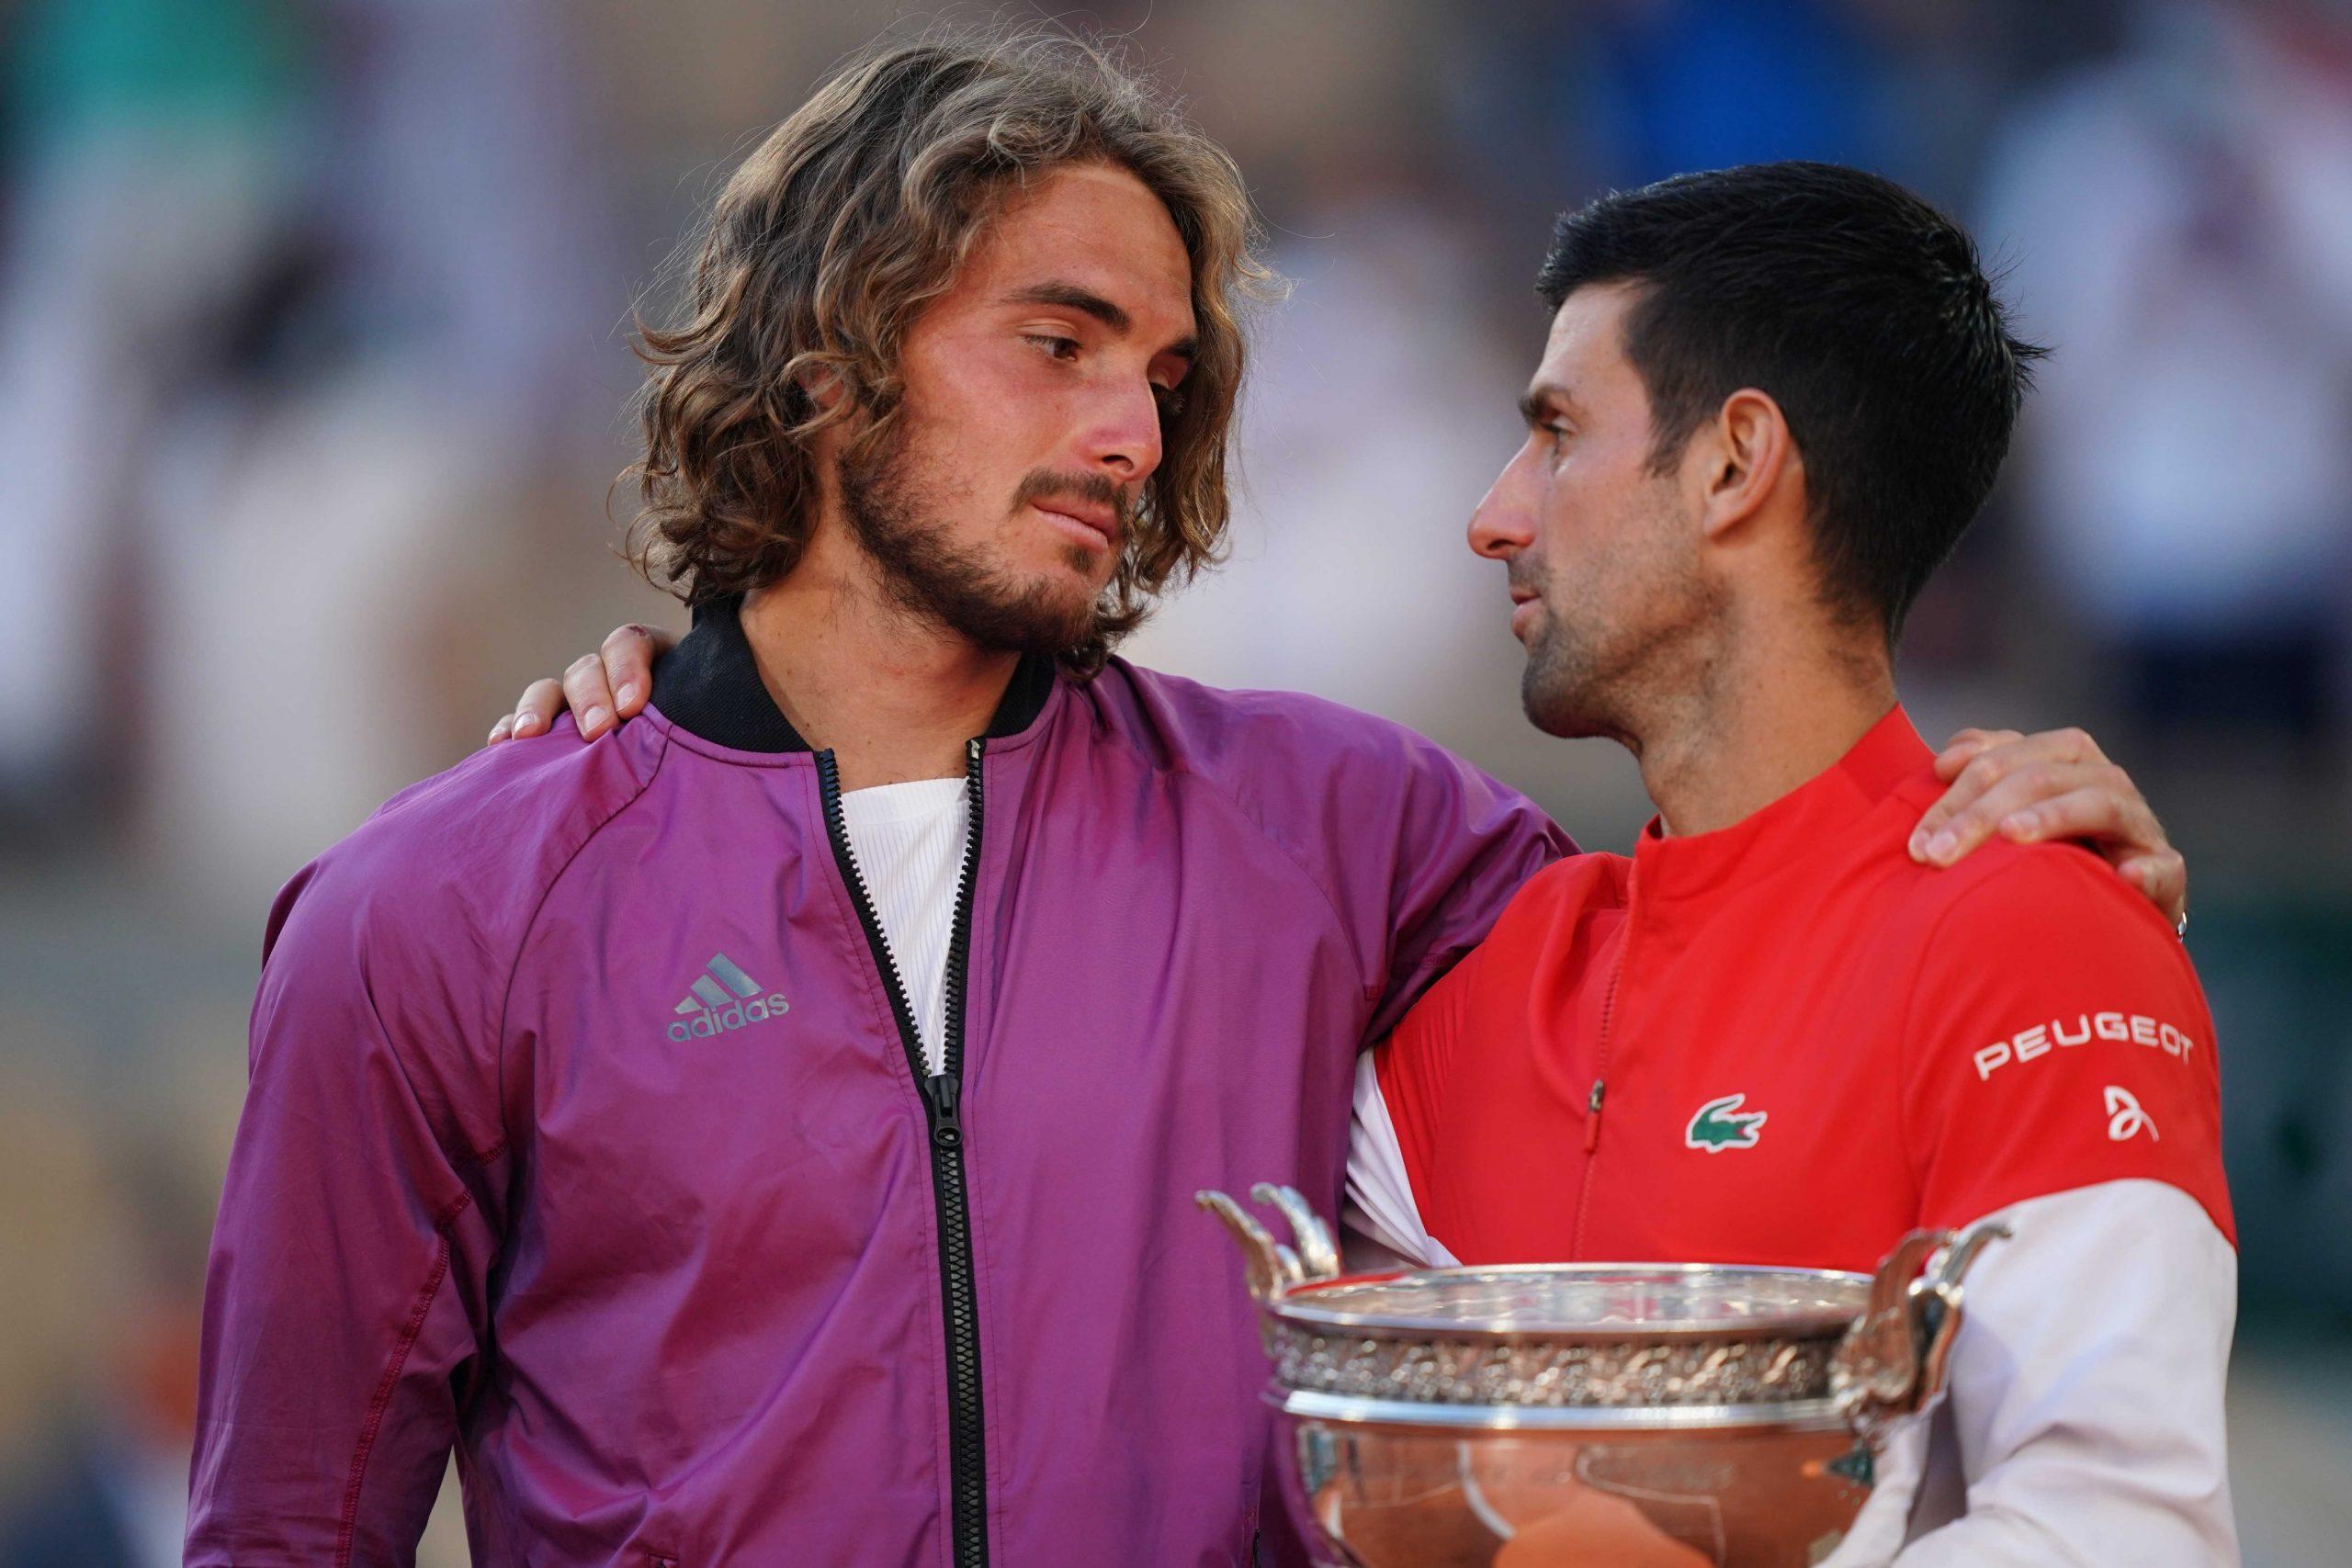 Novak Djokovic and Stefanos Tsitsipas at Roland Garros.